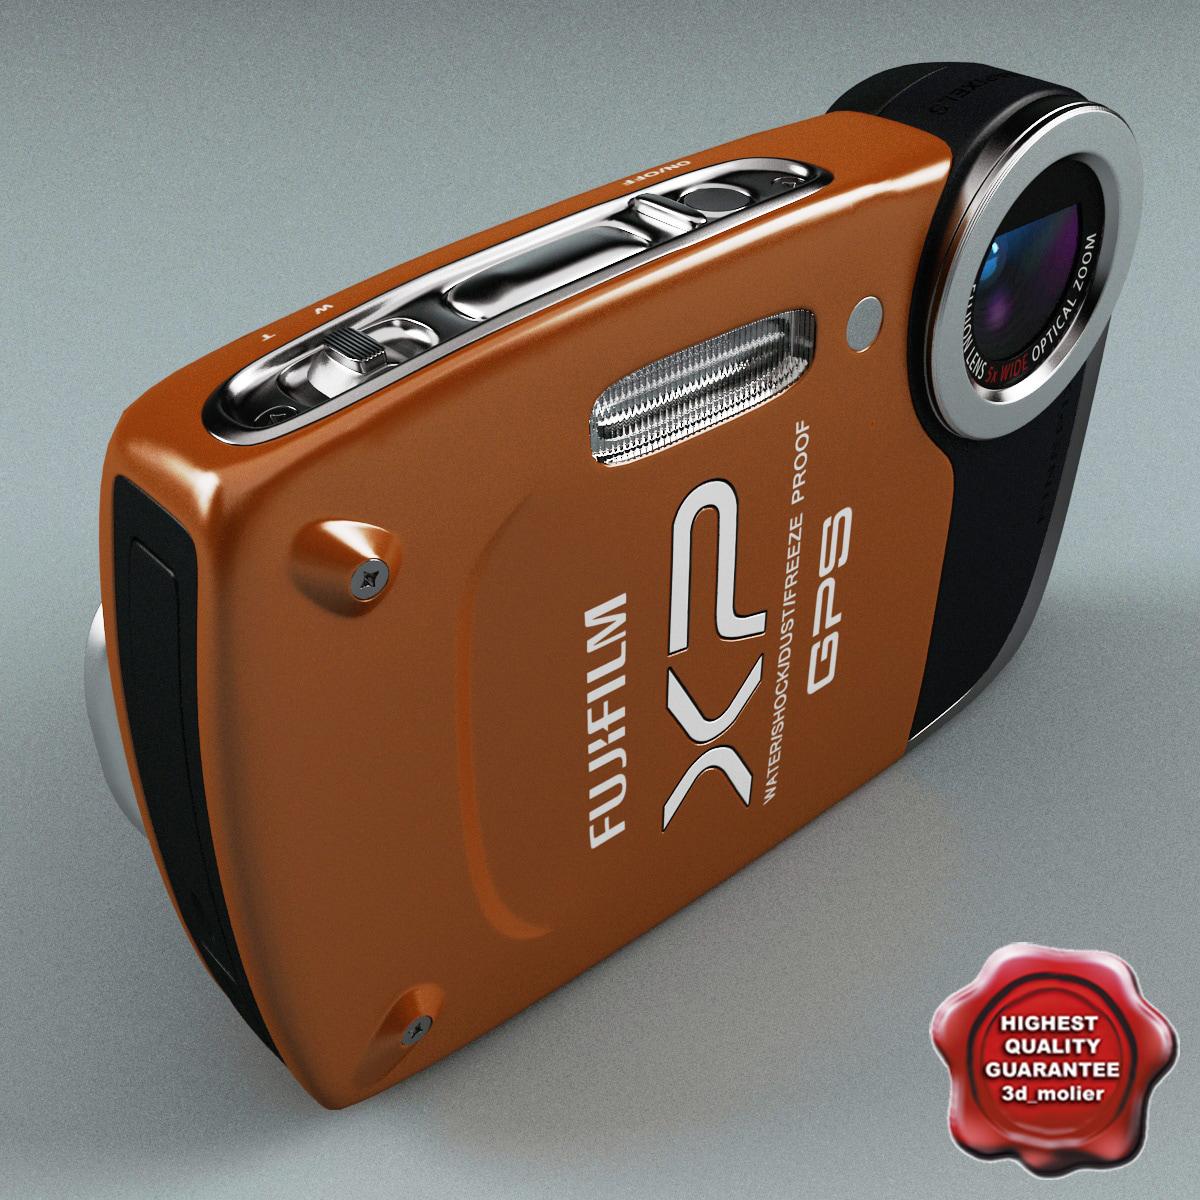 Fujifilm_FinePix_XP30_00.jpg